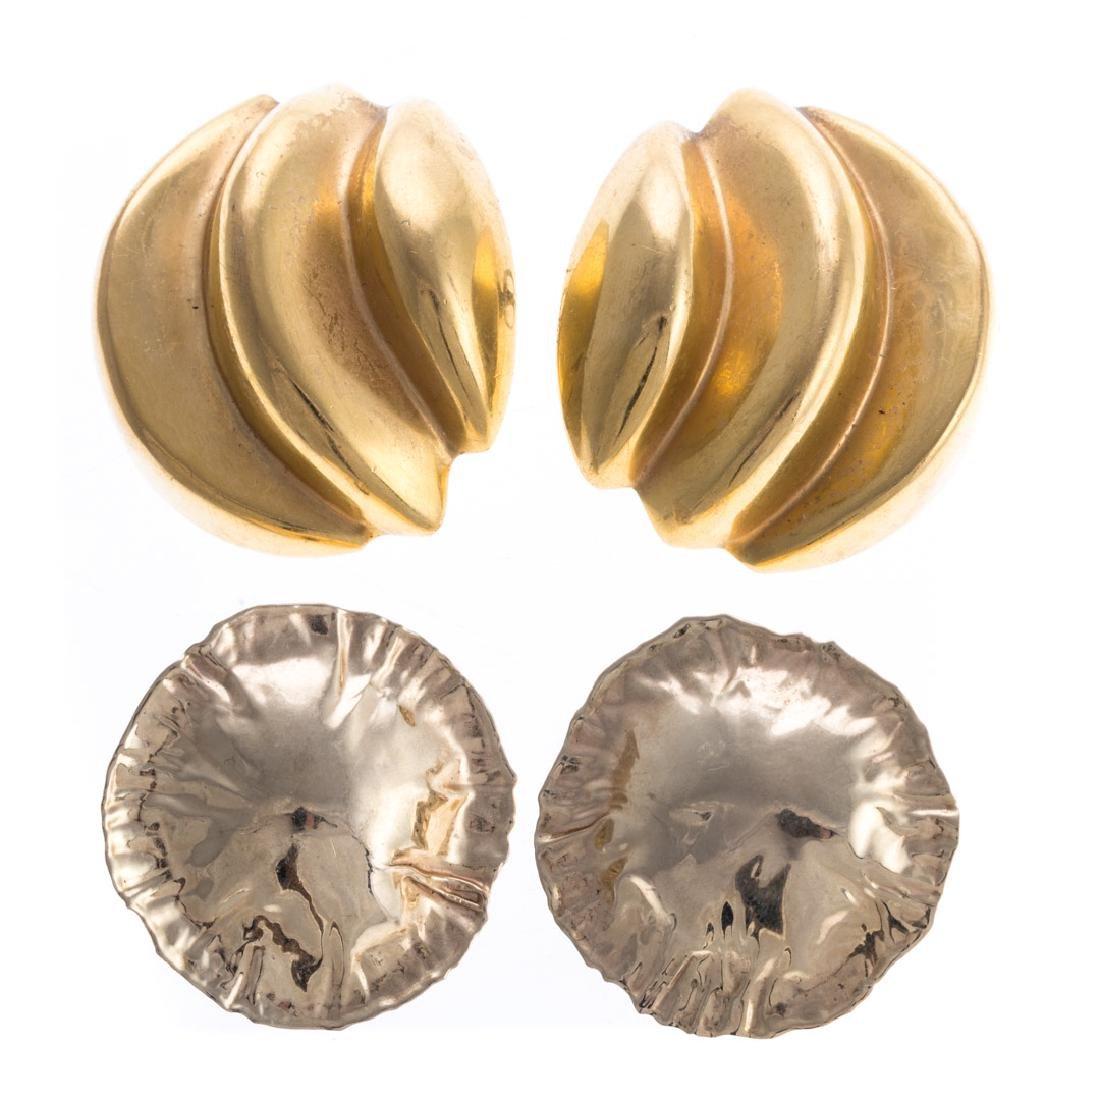 Two Pair of Lady's Earrings in 18K & 14K Gold